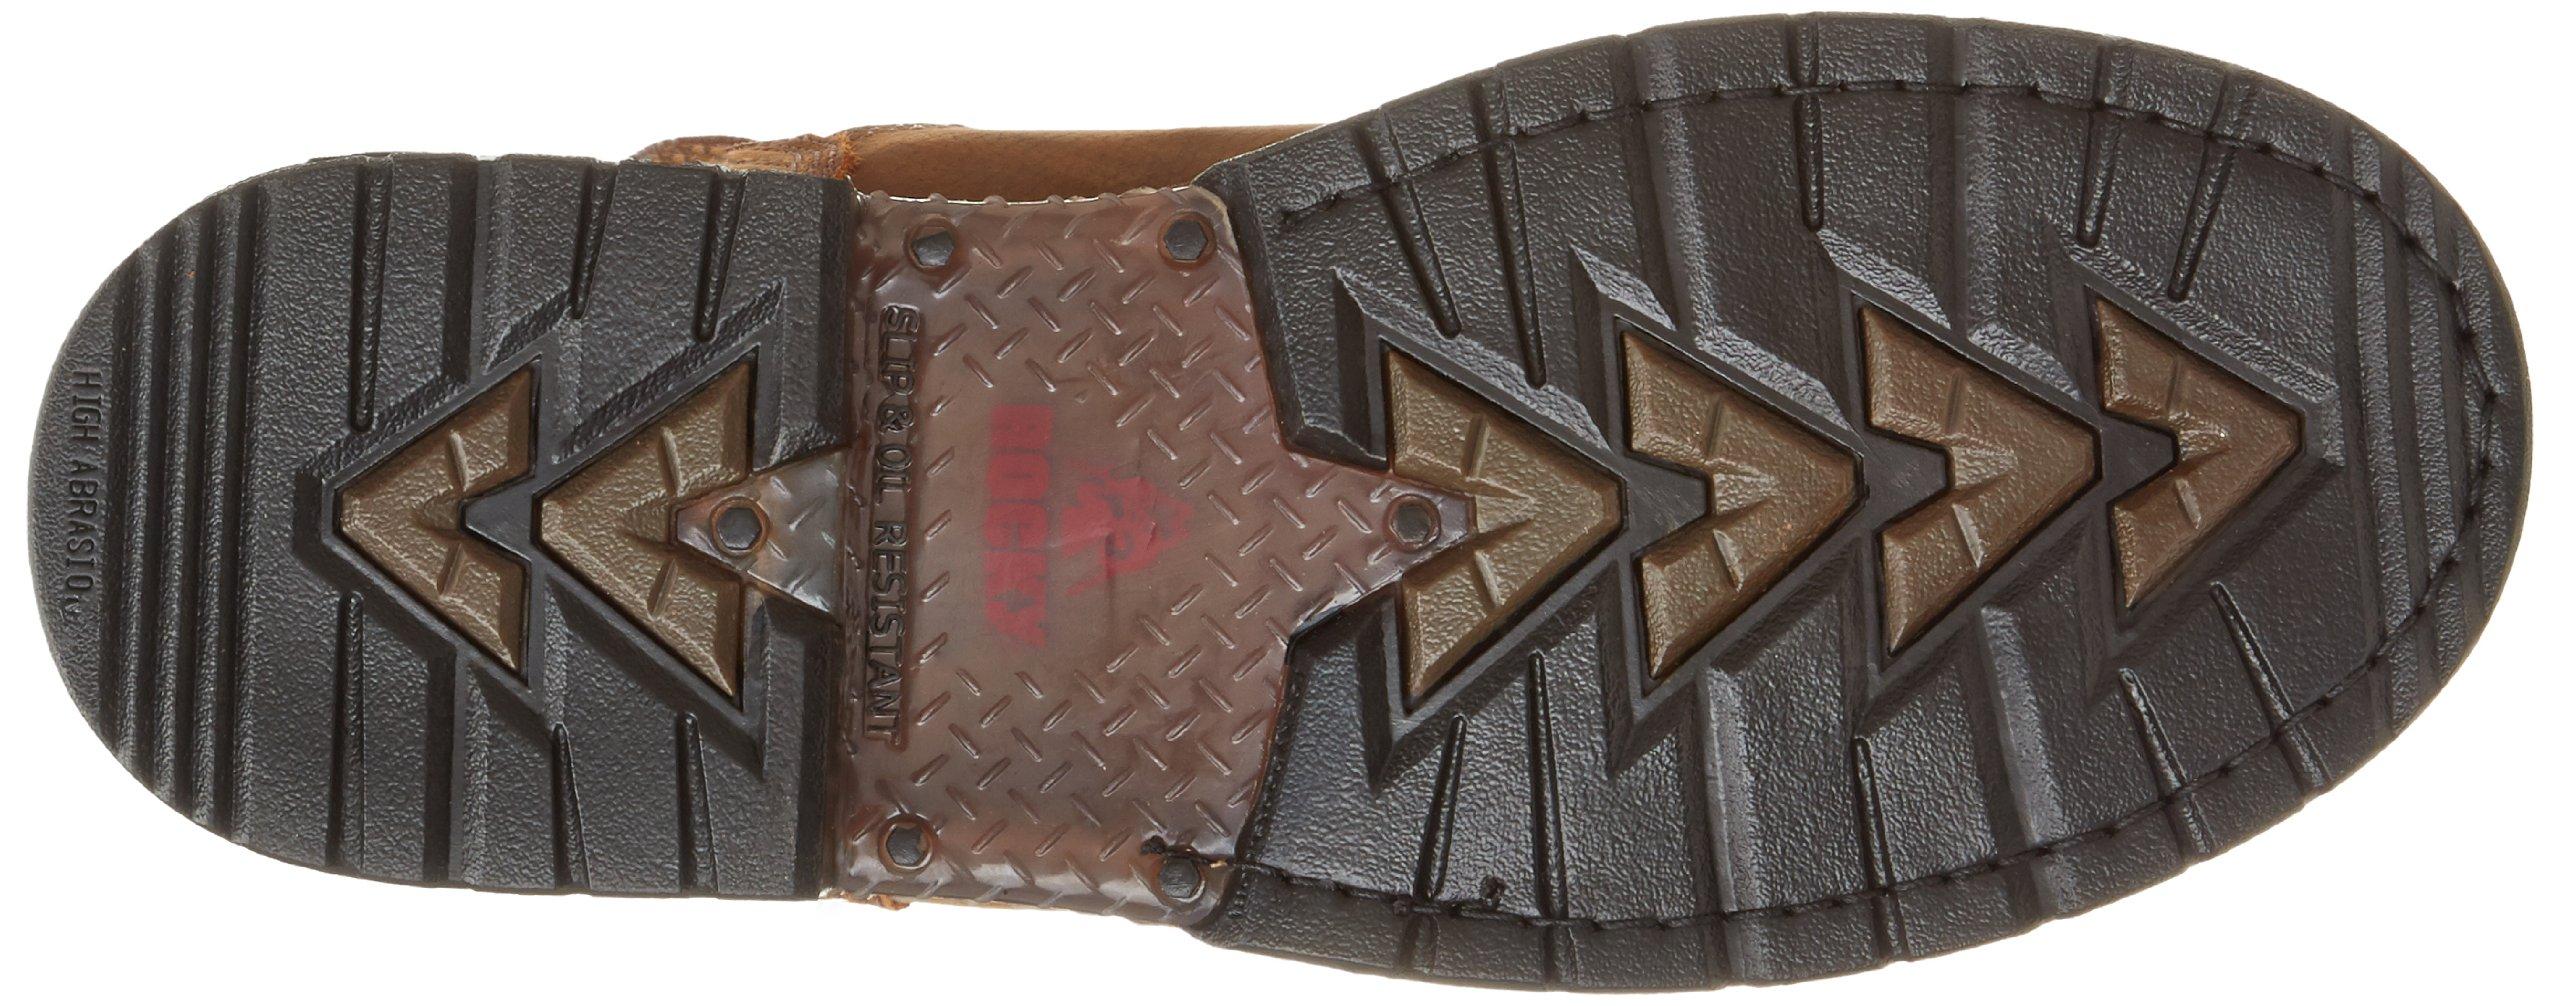 Rocky Men's Iron Clad Eight Inch LTT Steel Toe Work Boot,Brown,13 M US by Rocky (Image #3)